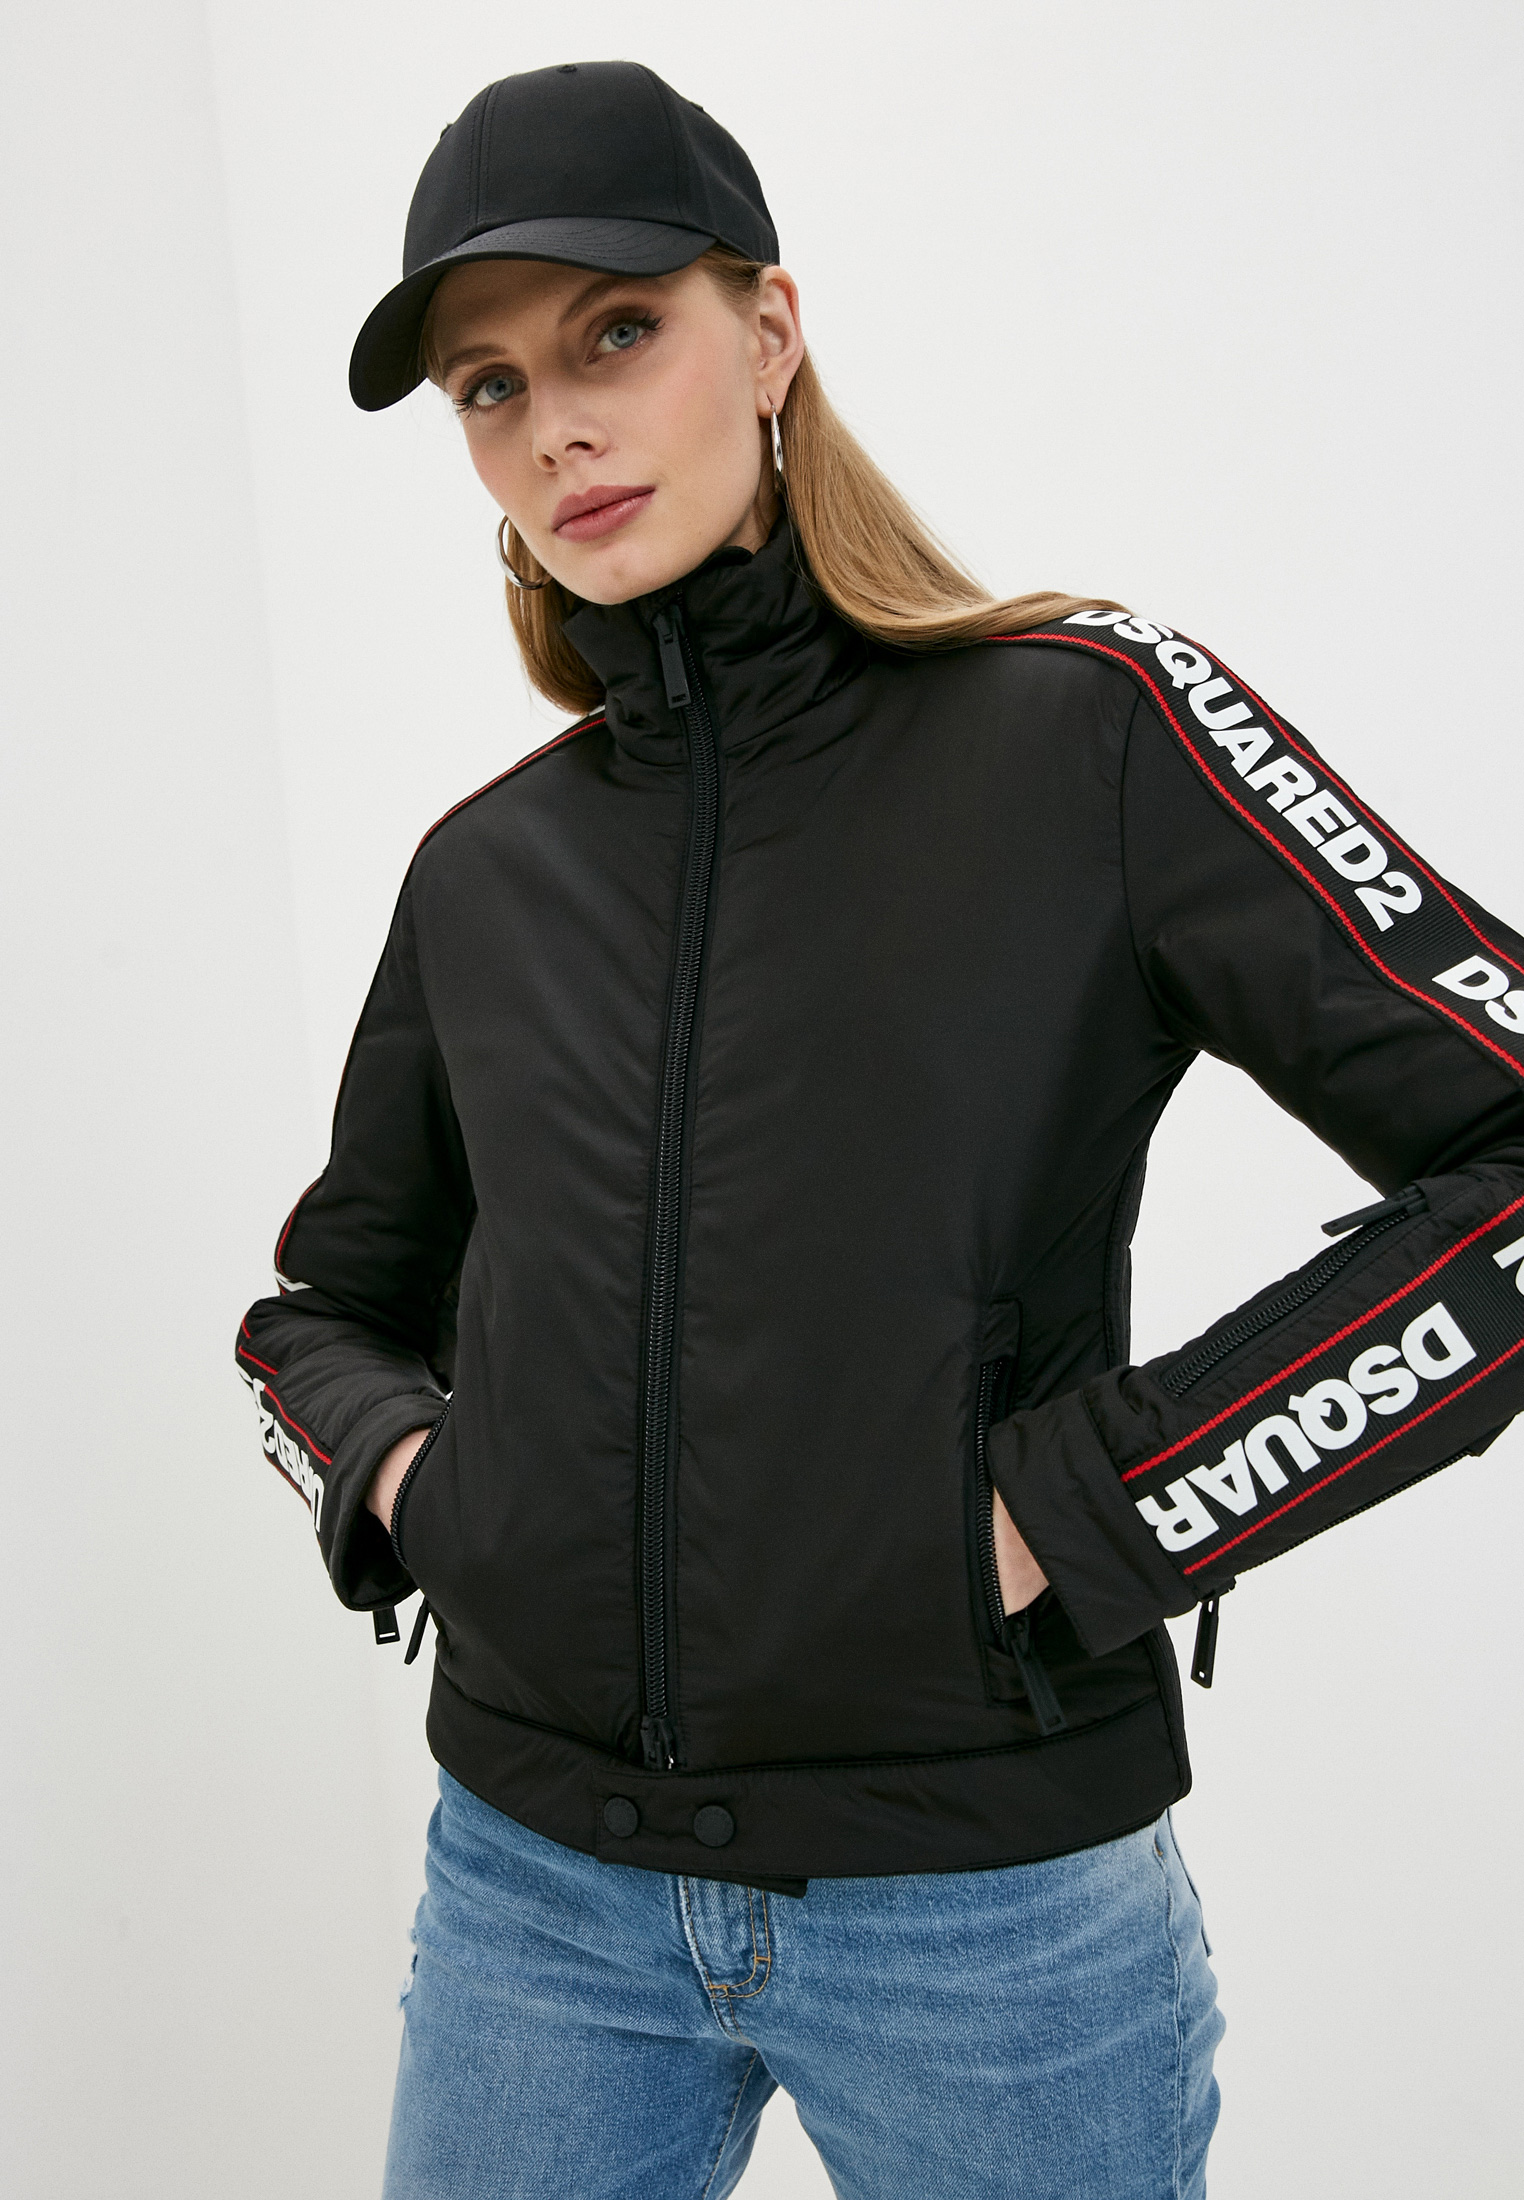 Утепленная куртка Dsquared2 Куртка утепленная Dsquared2